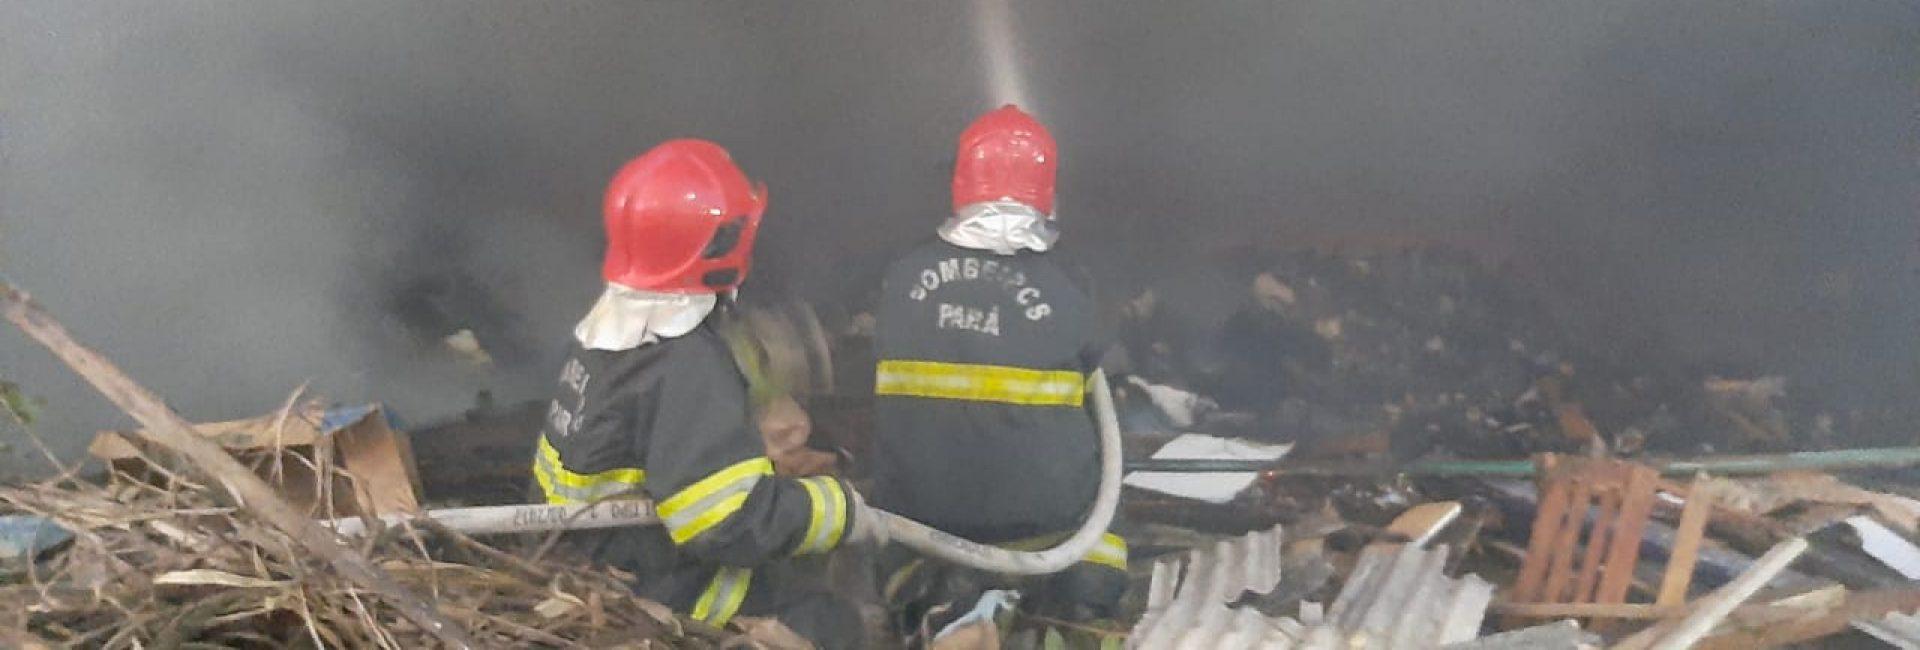 CBMPA realiza combate a incêndio na Sacramenta